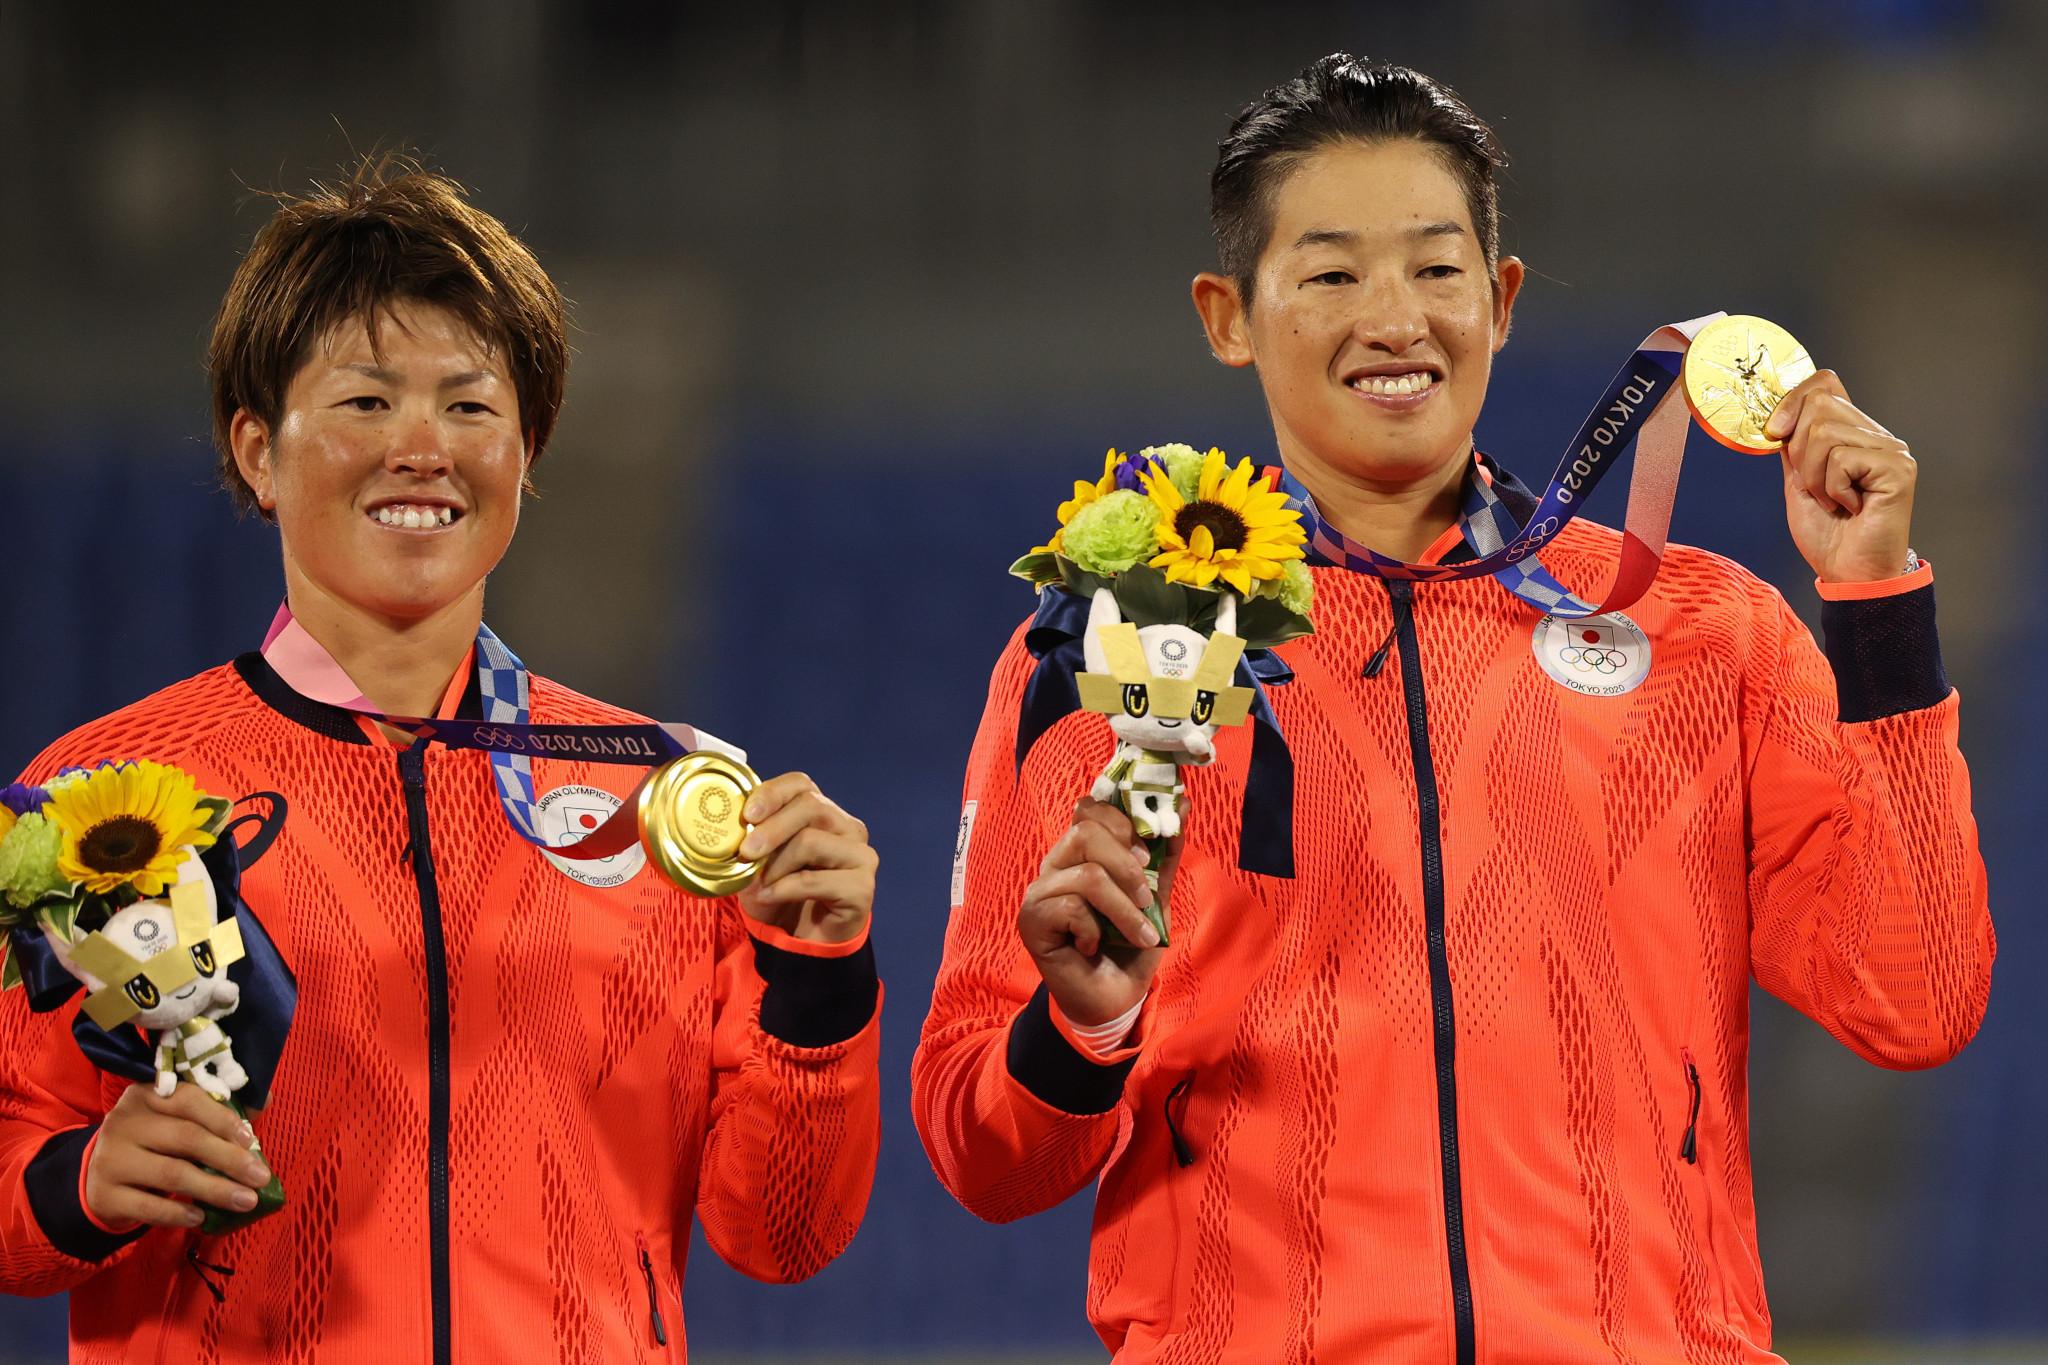 Japan's Yamato Fujita named Tokyo 2020 softball MVP as All-Olympic Team revealed